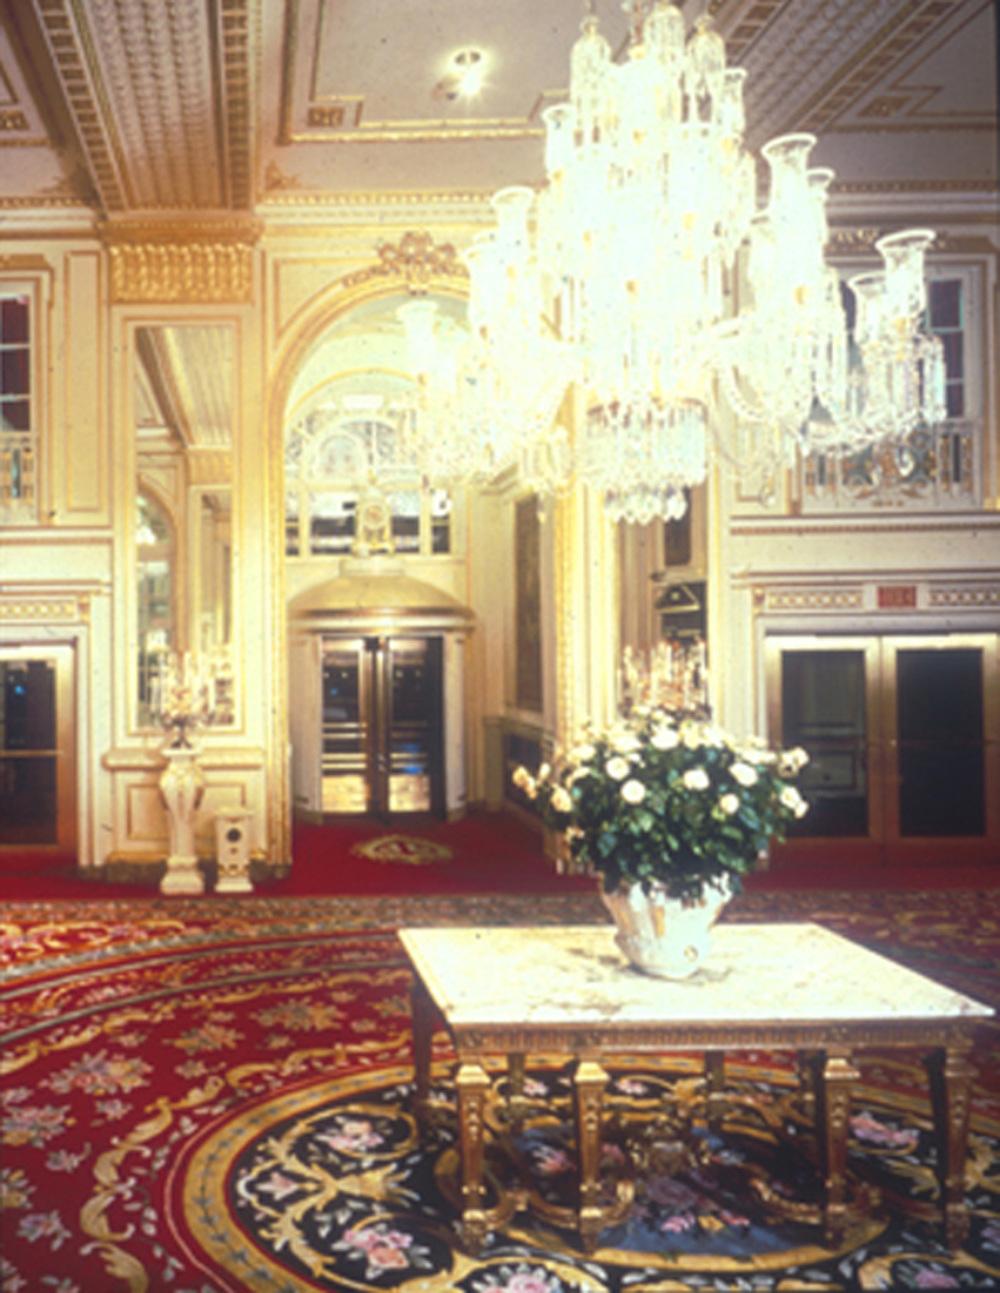 Plaza - Interior Foyer with Chandelier.jpg